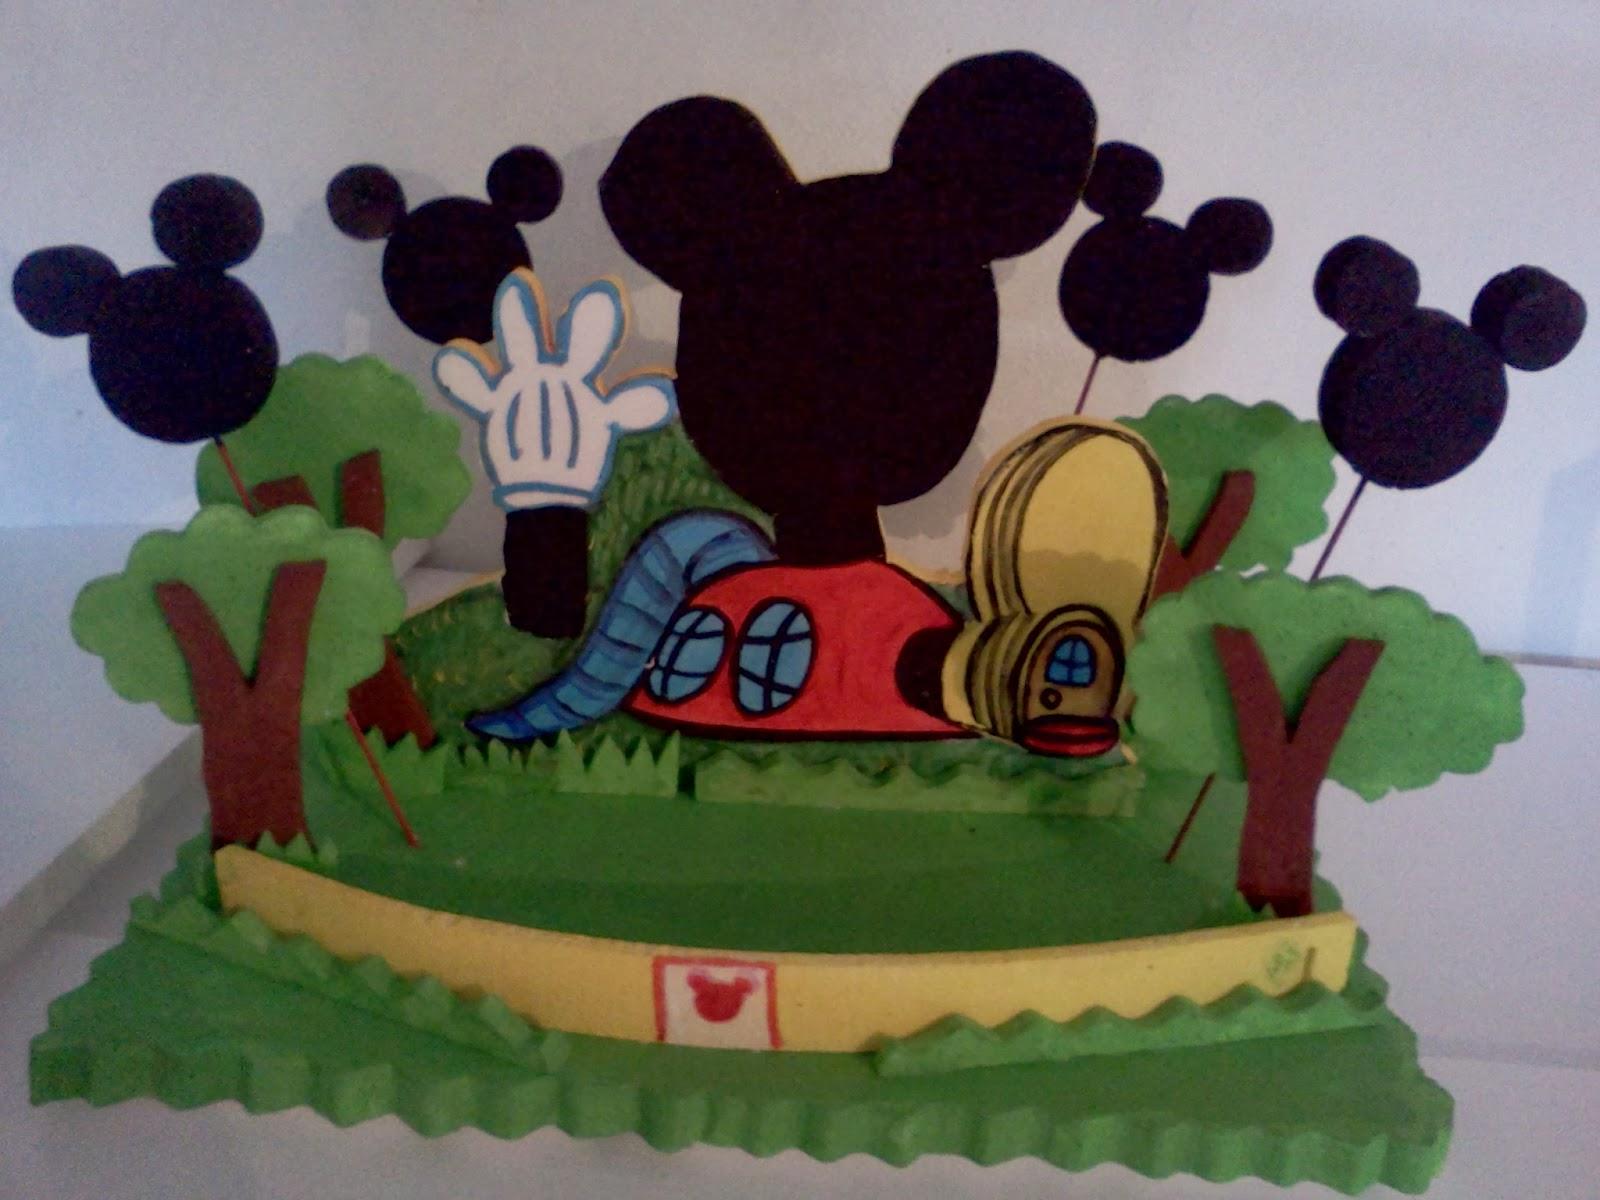 Imagenes de chupeteros de Mickey Mouse - Imagui